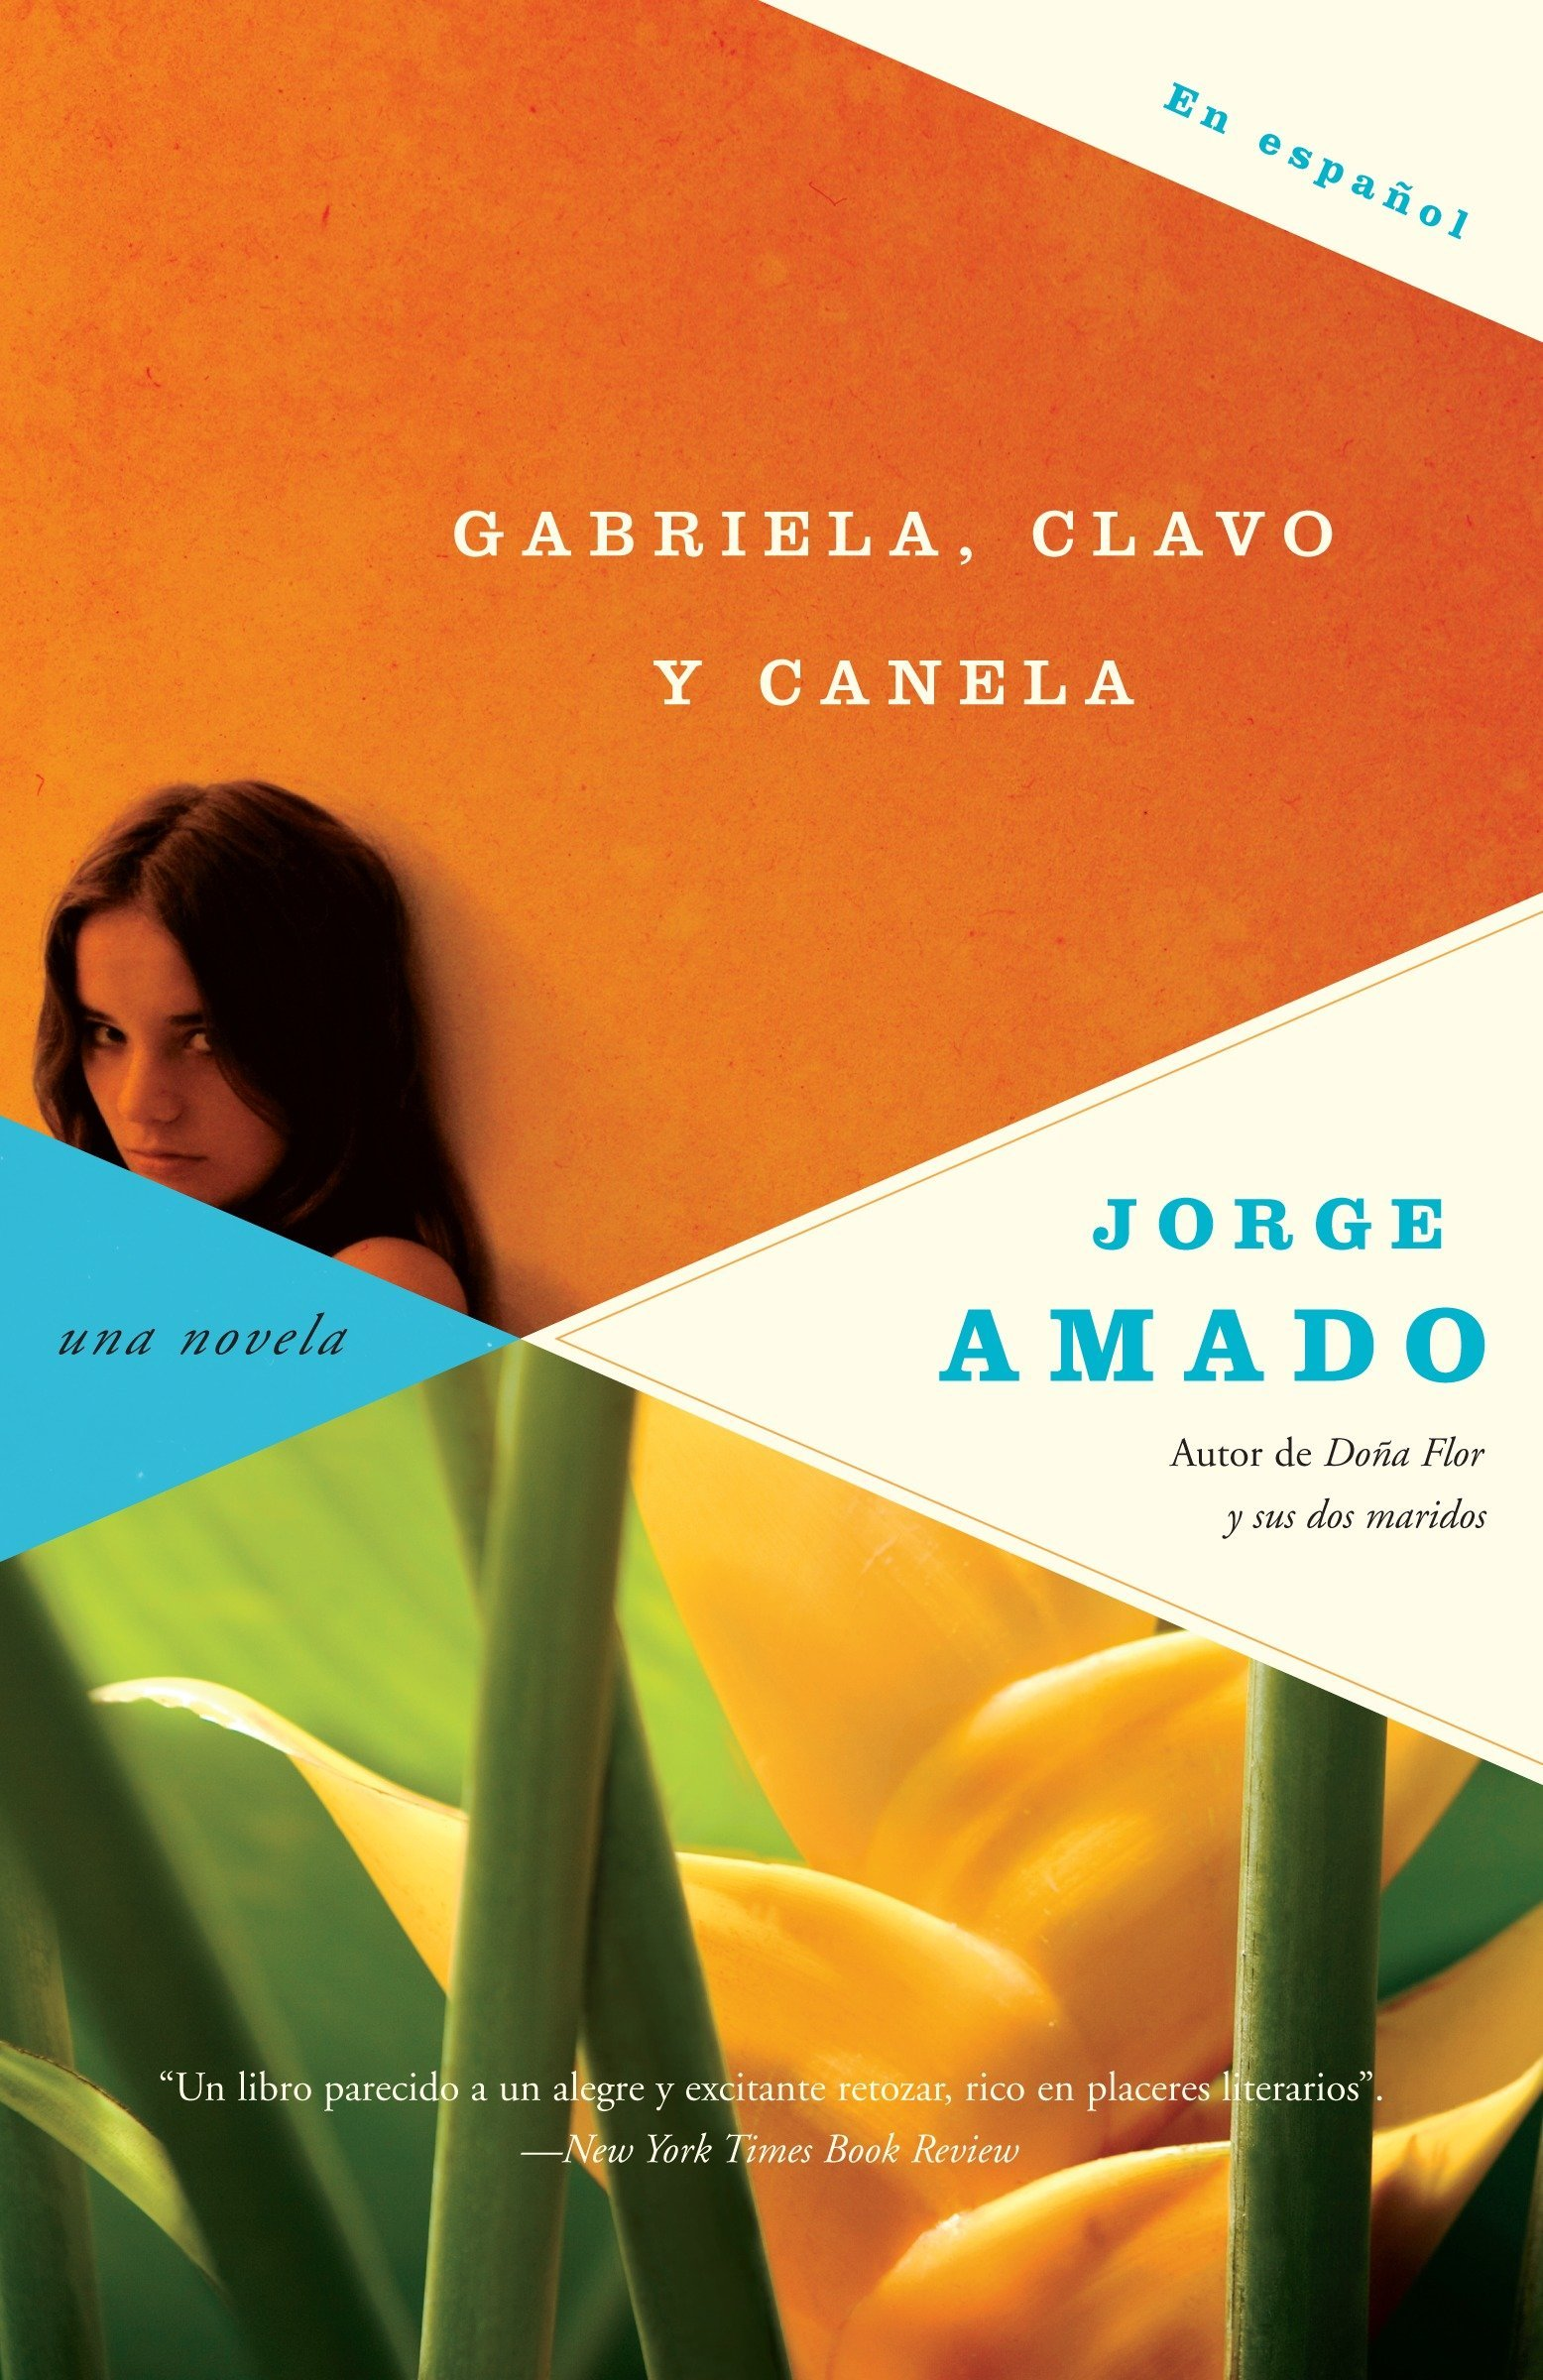 Amazon.com: Gabriela, clavo y canela (Spanish Edition) (9780307279569):  Jorge Amado: Books